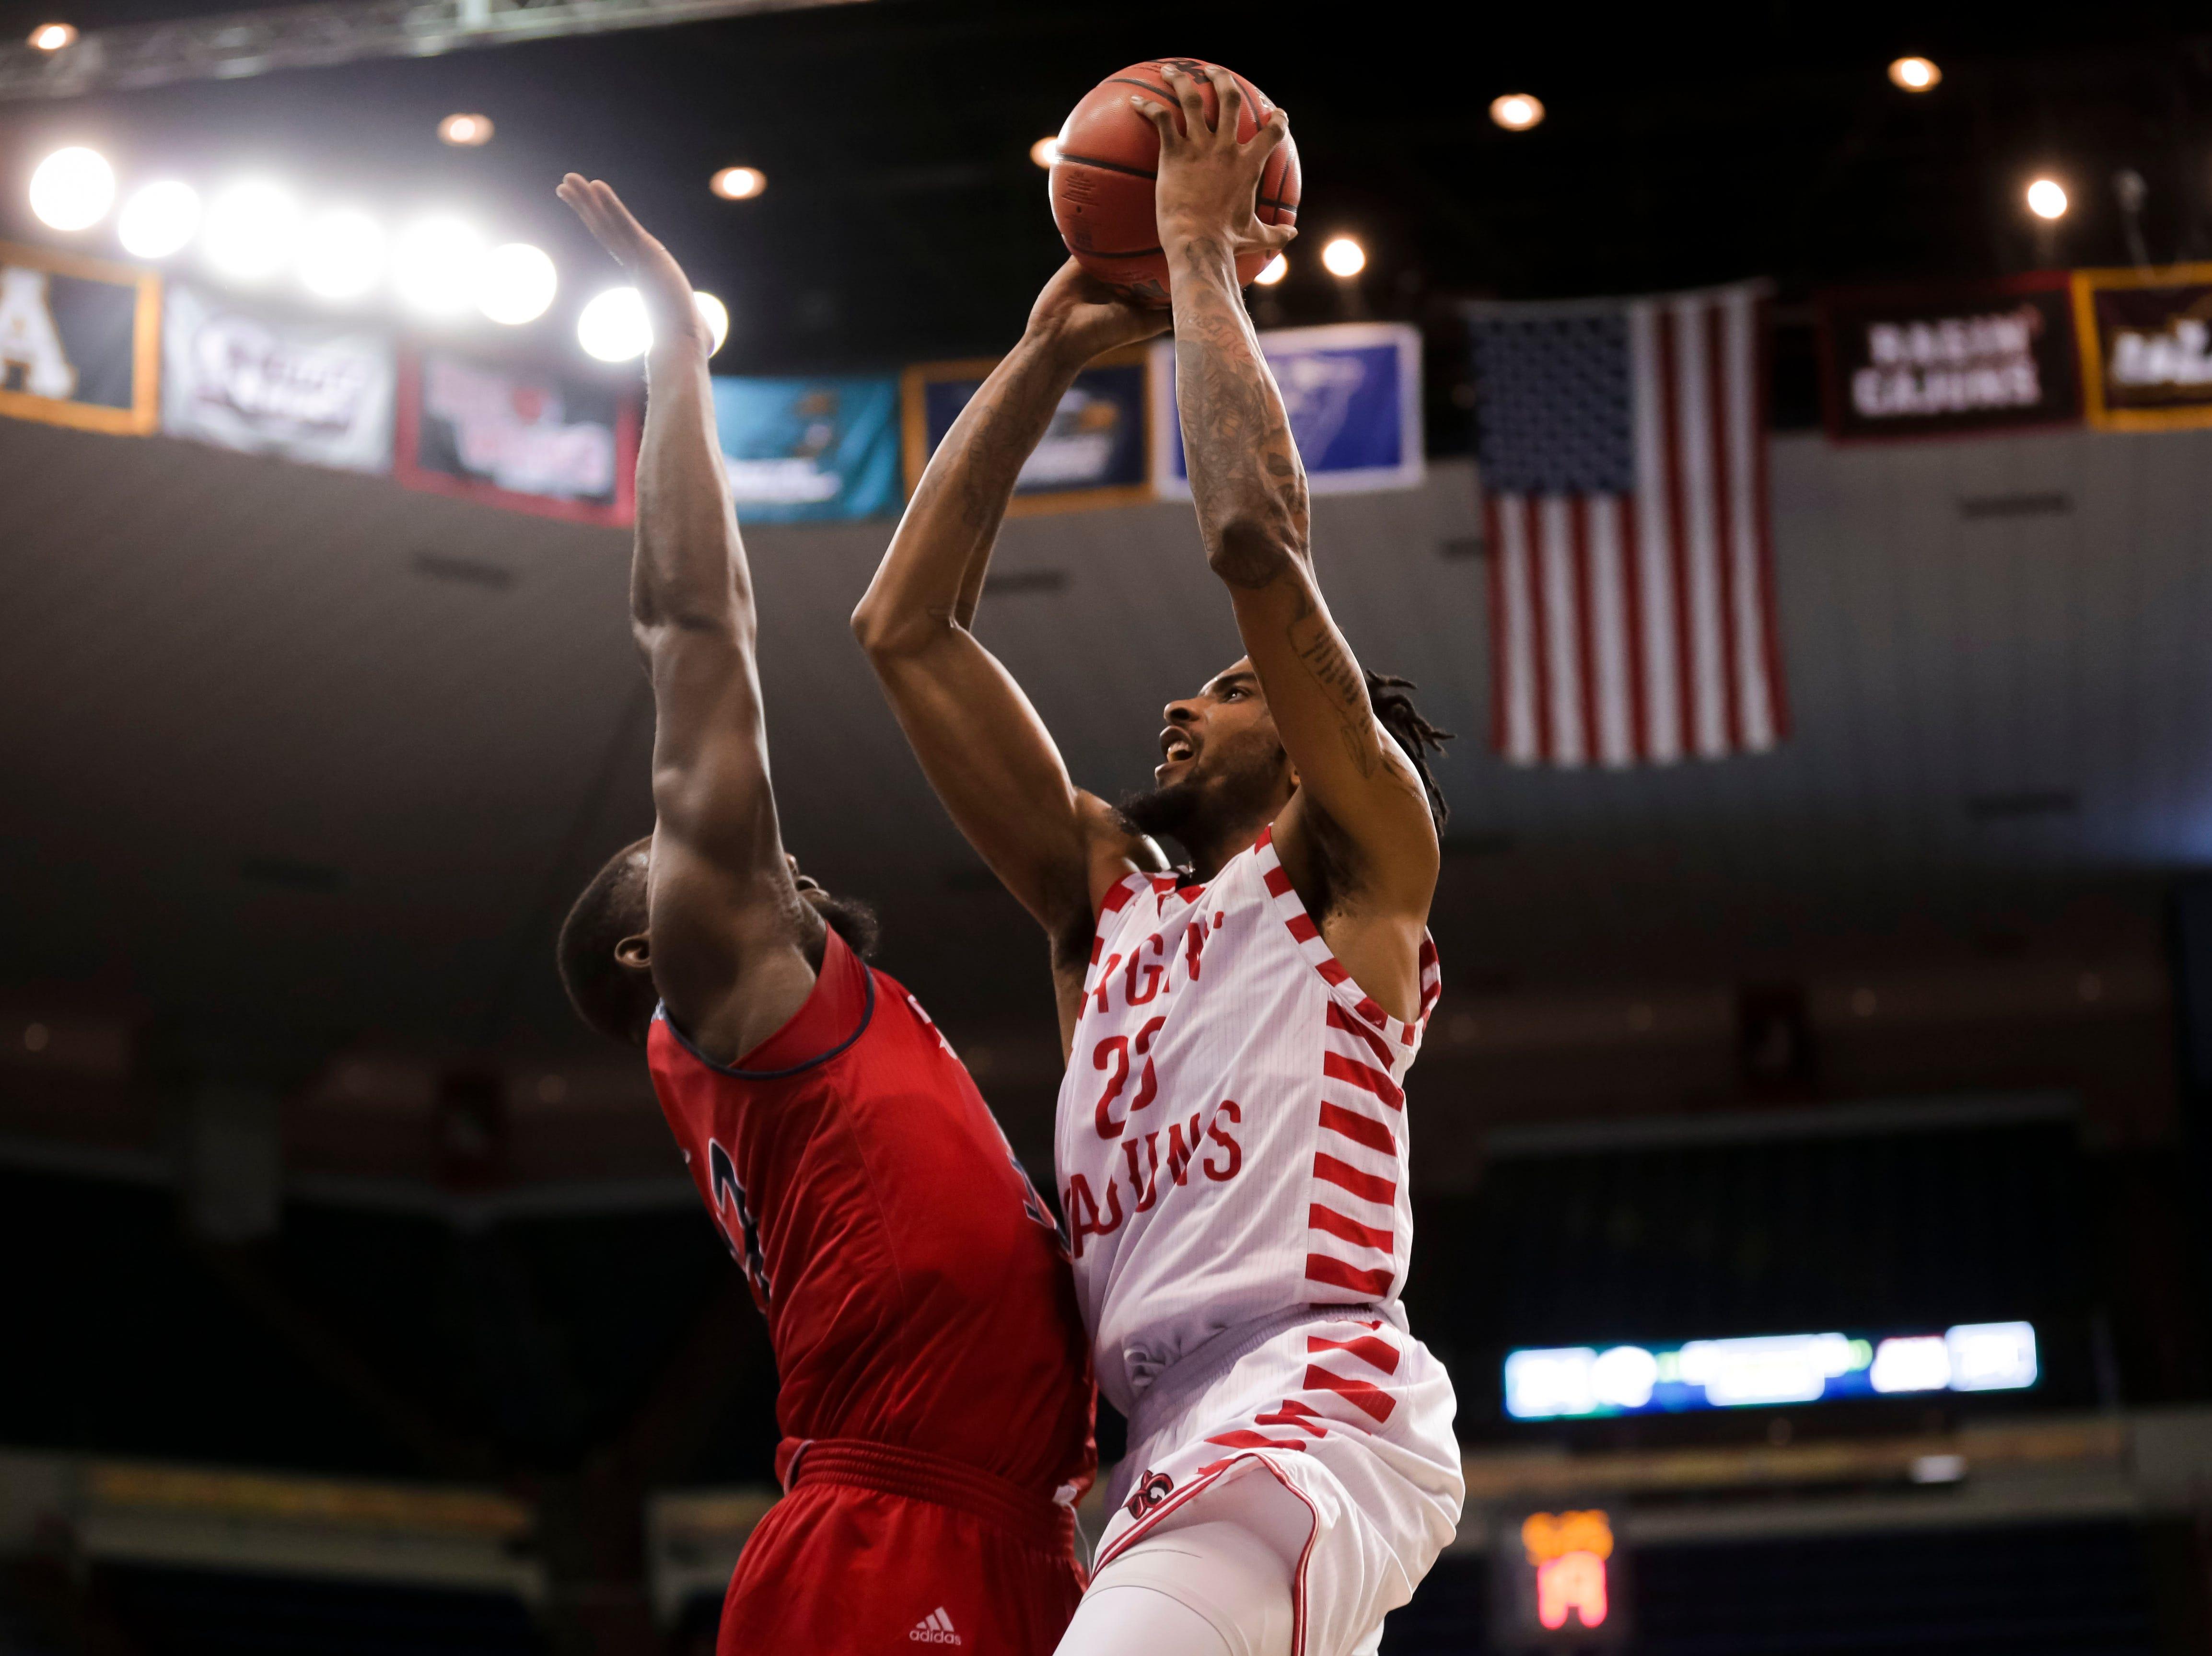 Jakeenan Gant goes up for a basket against South Alabama on Thursday at the Sun Belt Men's Basketball Championship in New Orleans.